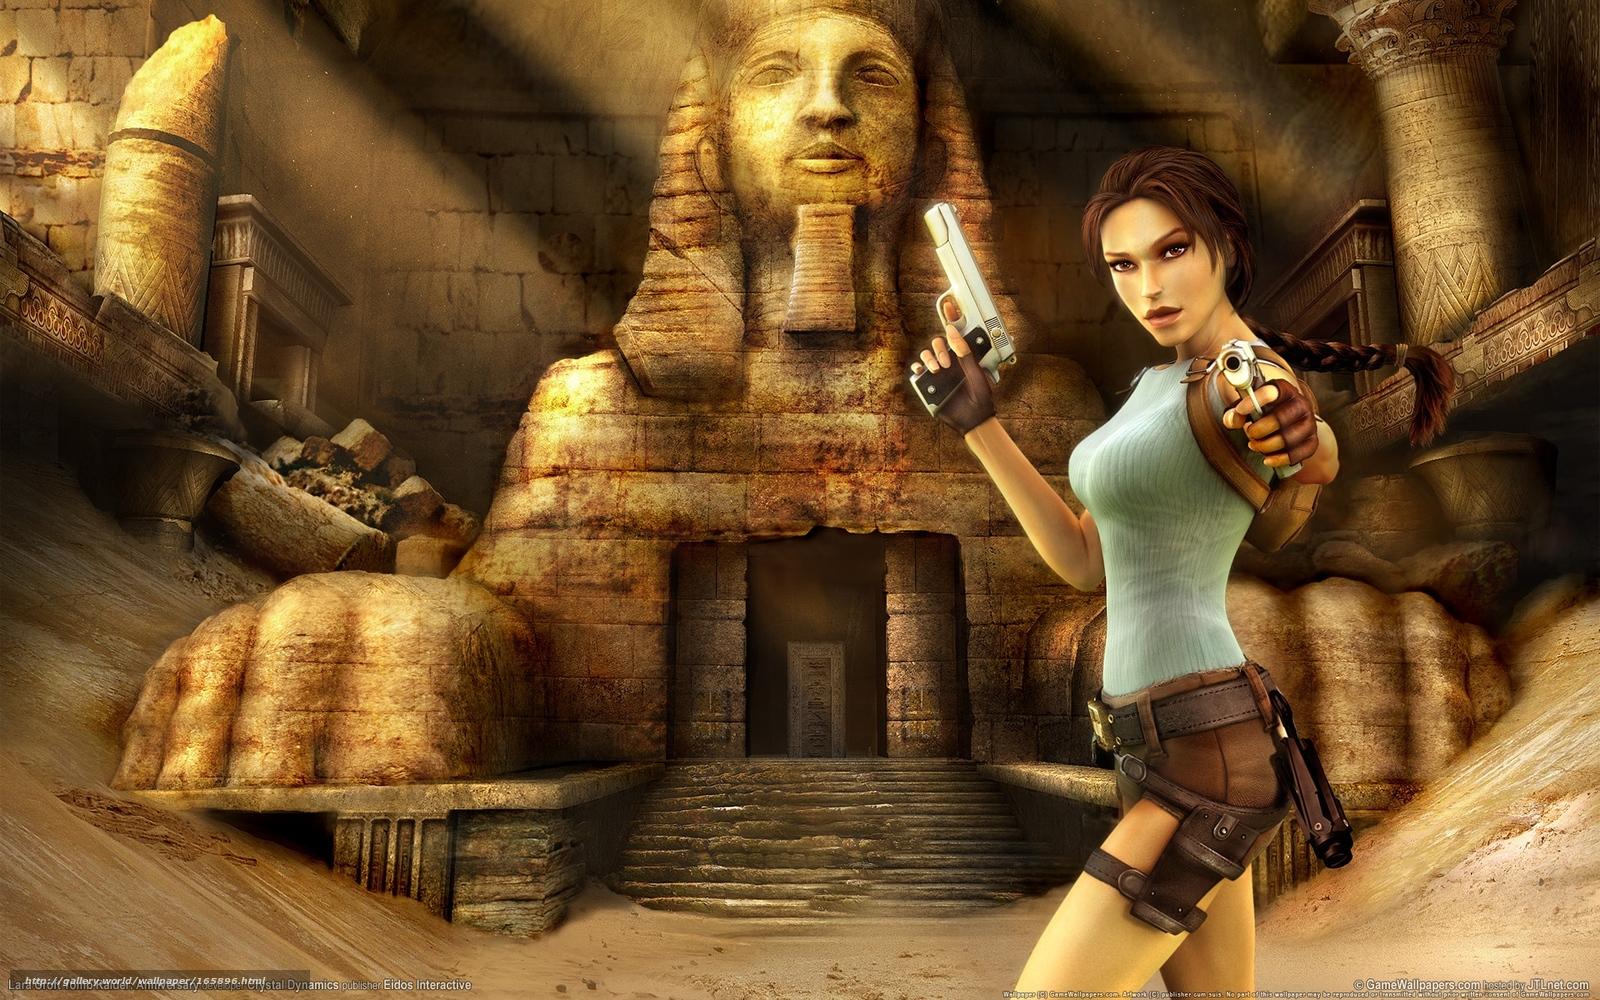 Lara croft cartoon anal sex pixs naked videos